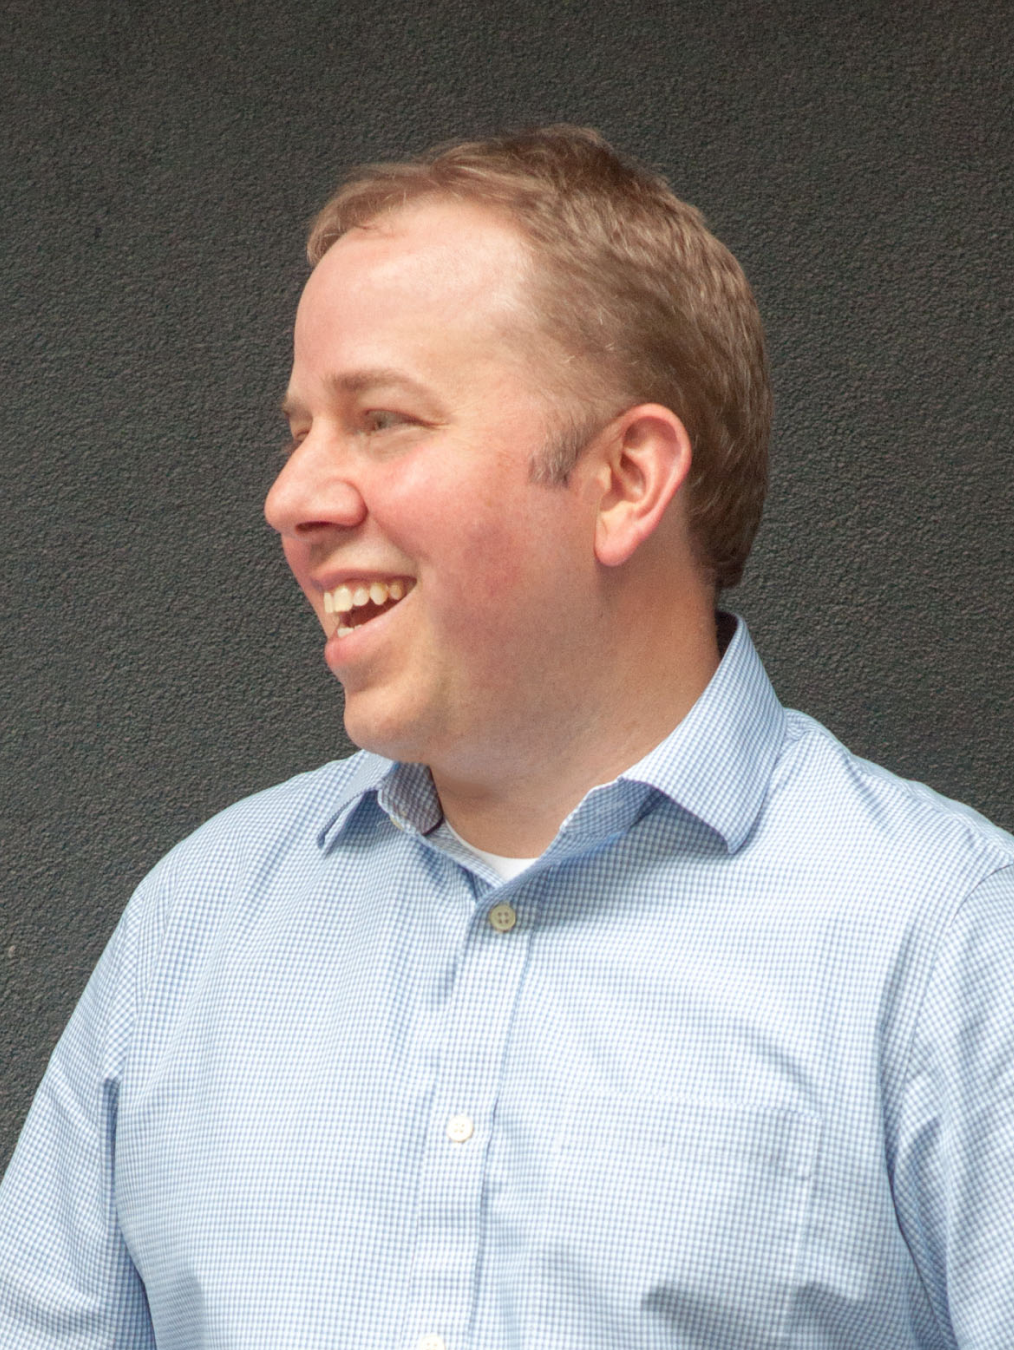 Kevin Rock - Principal Data Strategist